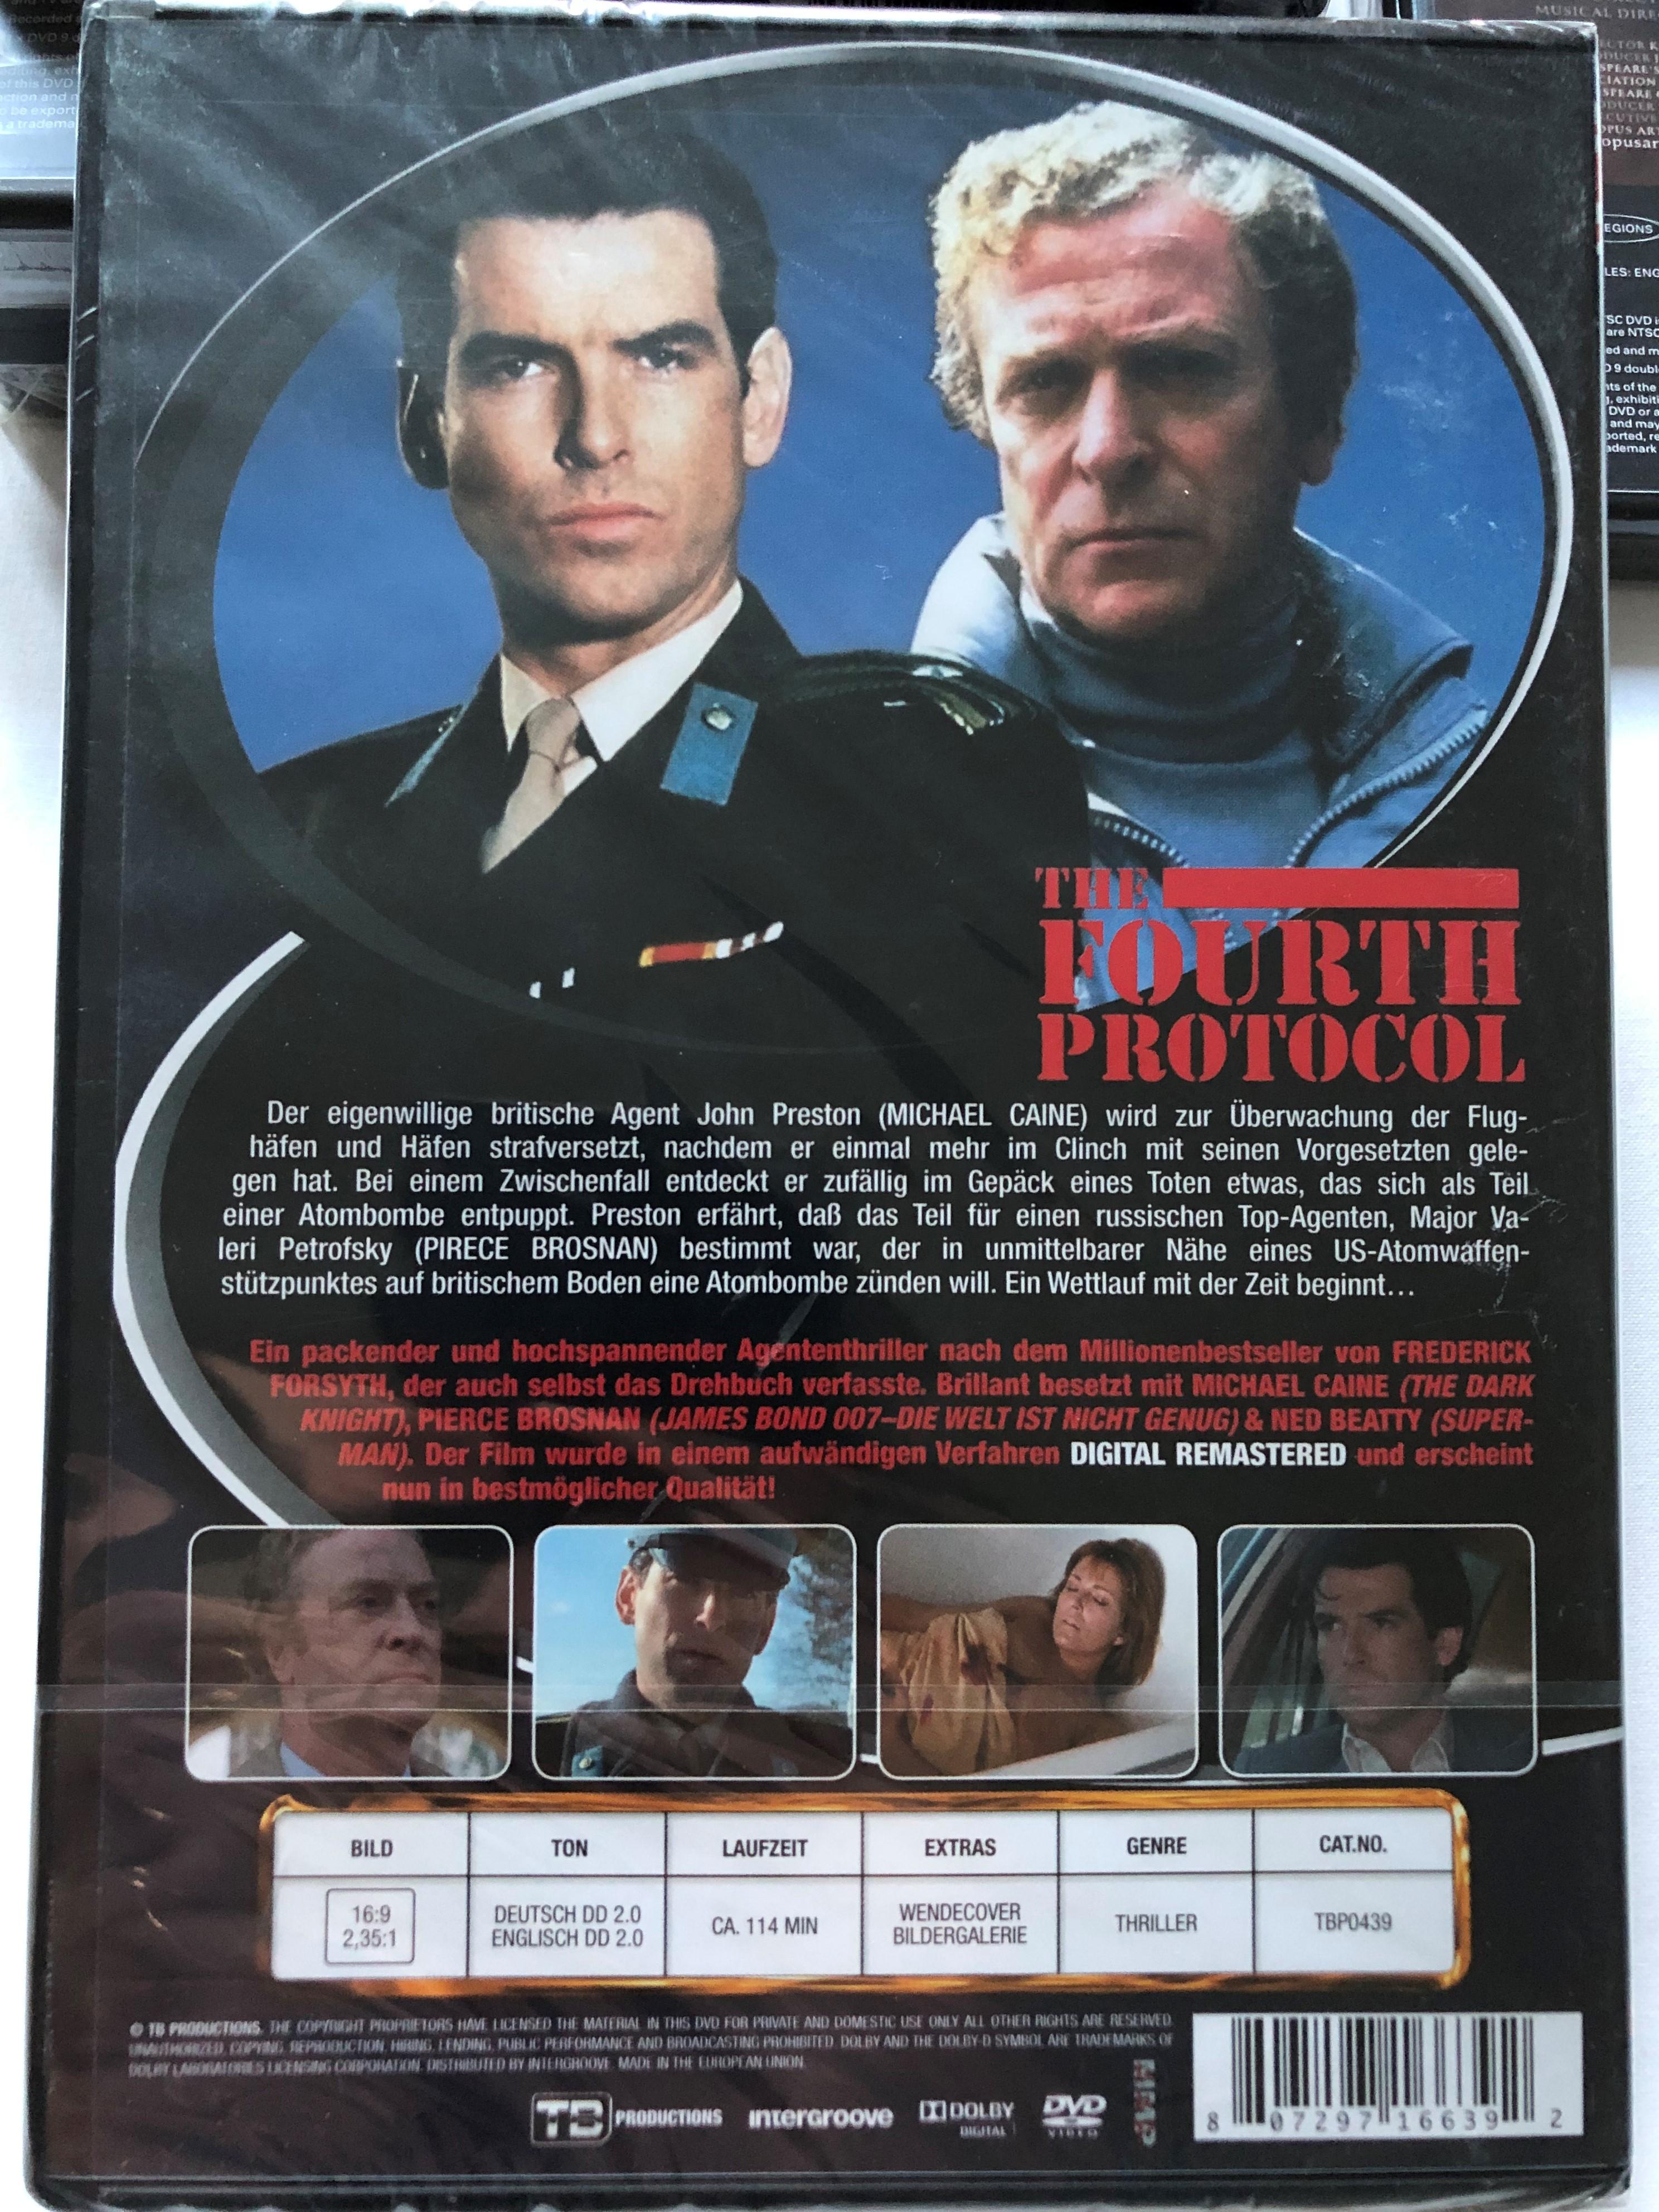 the-fourth-protocol-dvd-1987-das-vierte-protokoll-digital-remastered-directed-by-john-mackenzie-starring-pierce-brosnan-michael-caine-based-on-frederick-forsyth-s-bestseller-2-.jpg